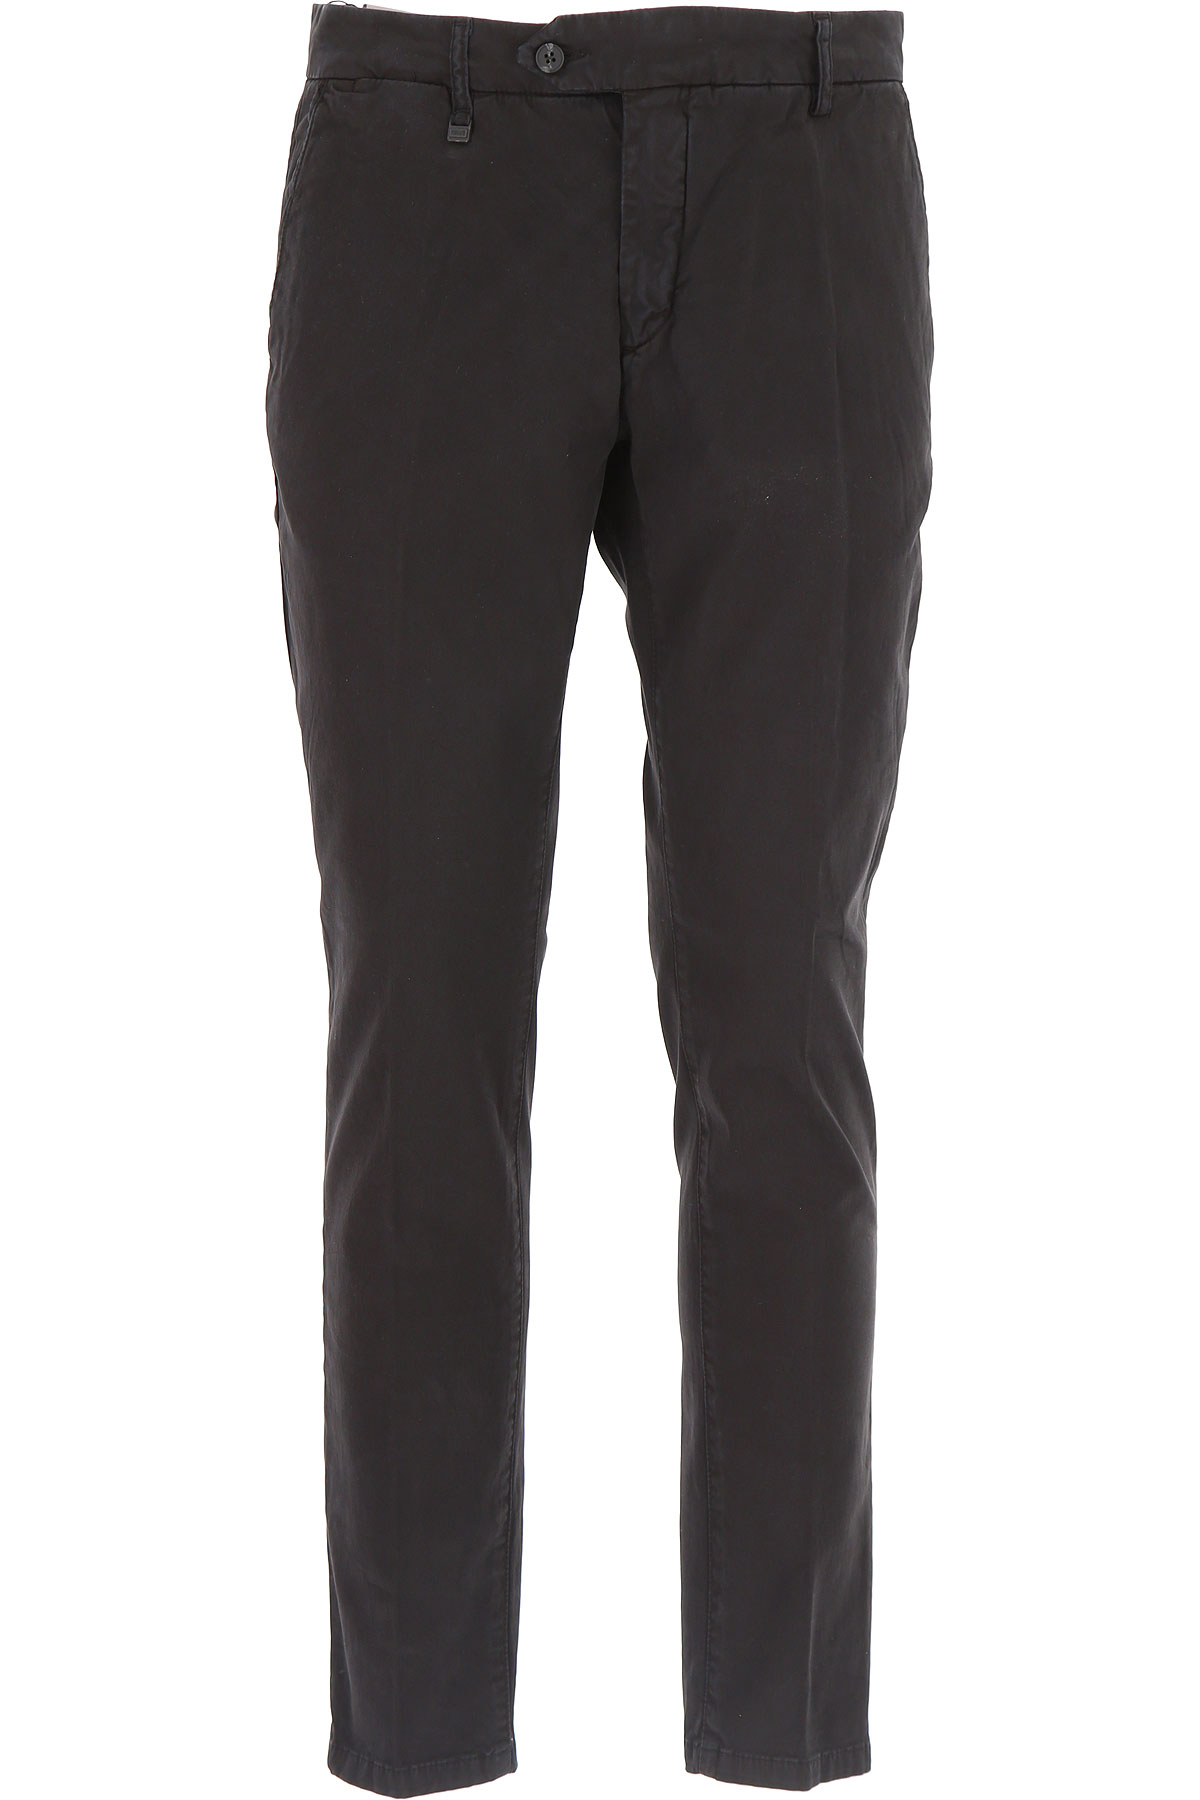 Antony Morato Pants for Men On Sale in Outlet, Black, Cotton, 2019, 32 36